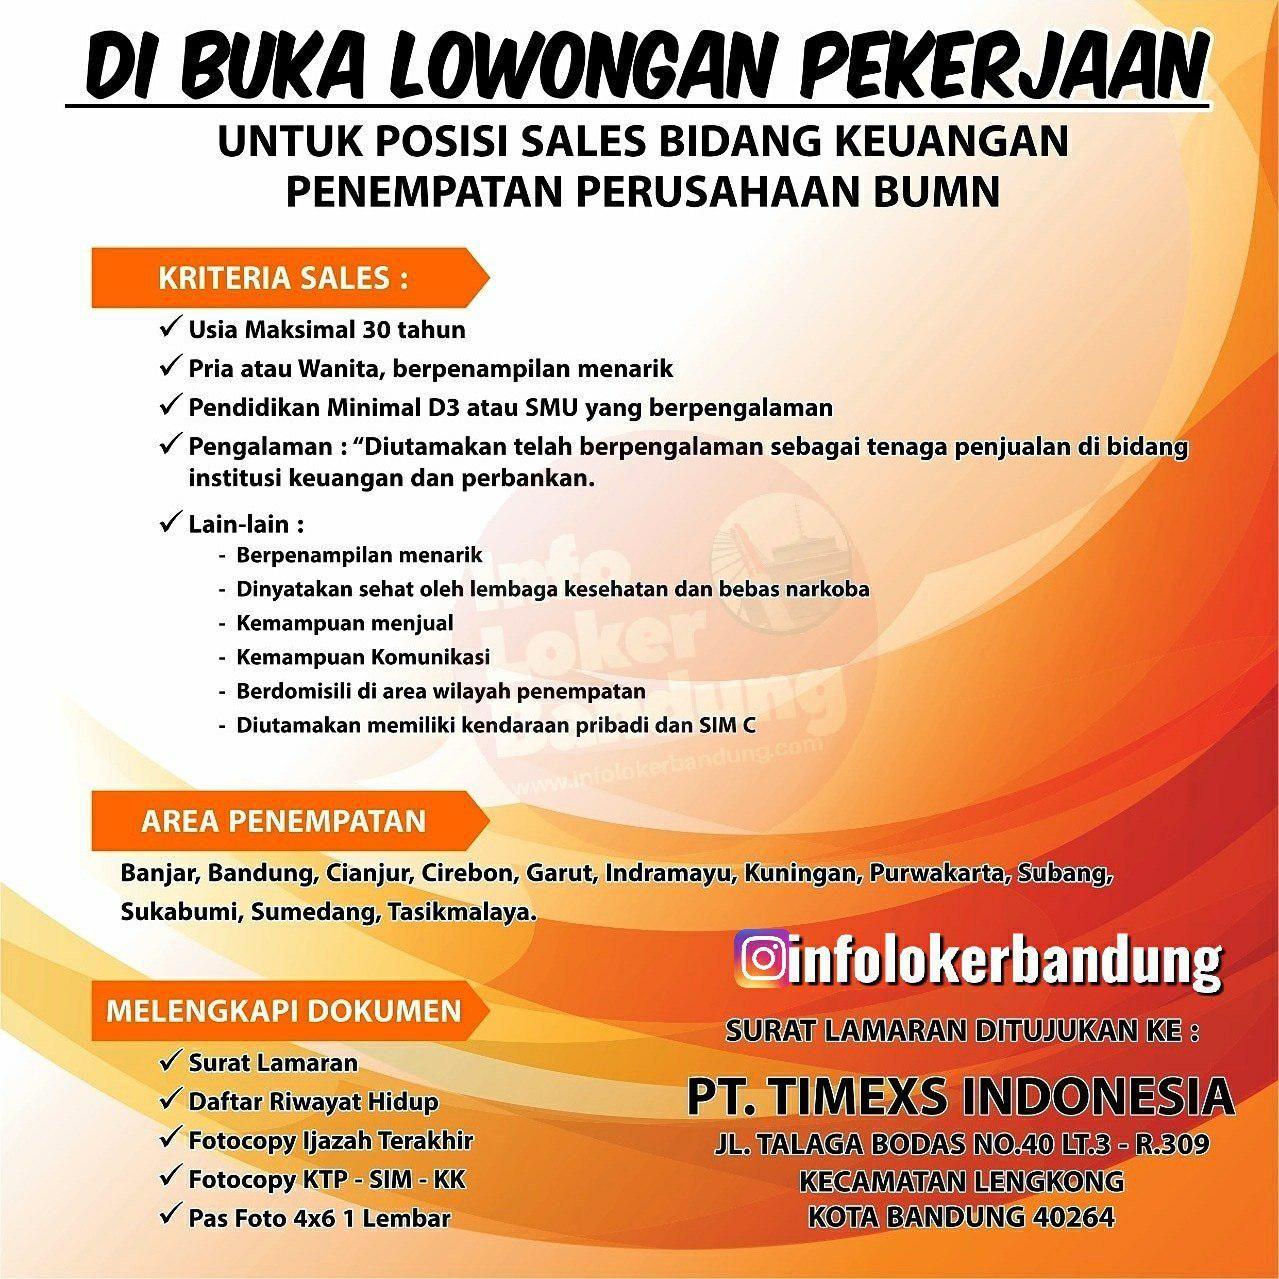 Lowongan Kerja Pt Timexs Indonesia Bandung Oktober 2019 Infolokerbandung Com Kerja Indonesia Brosur